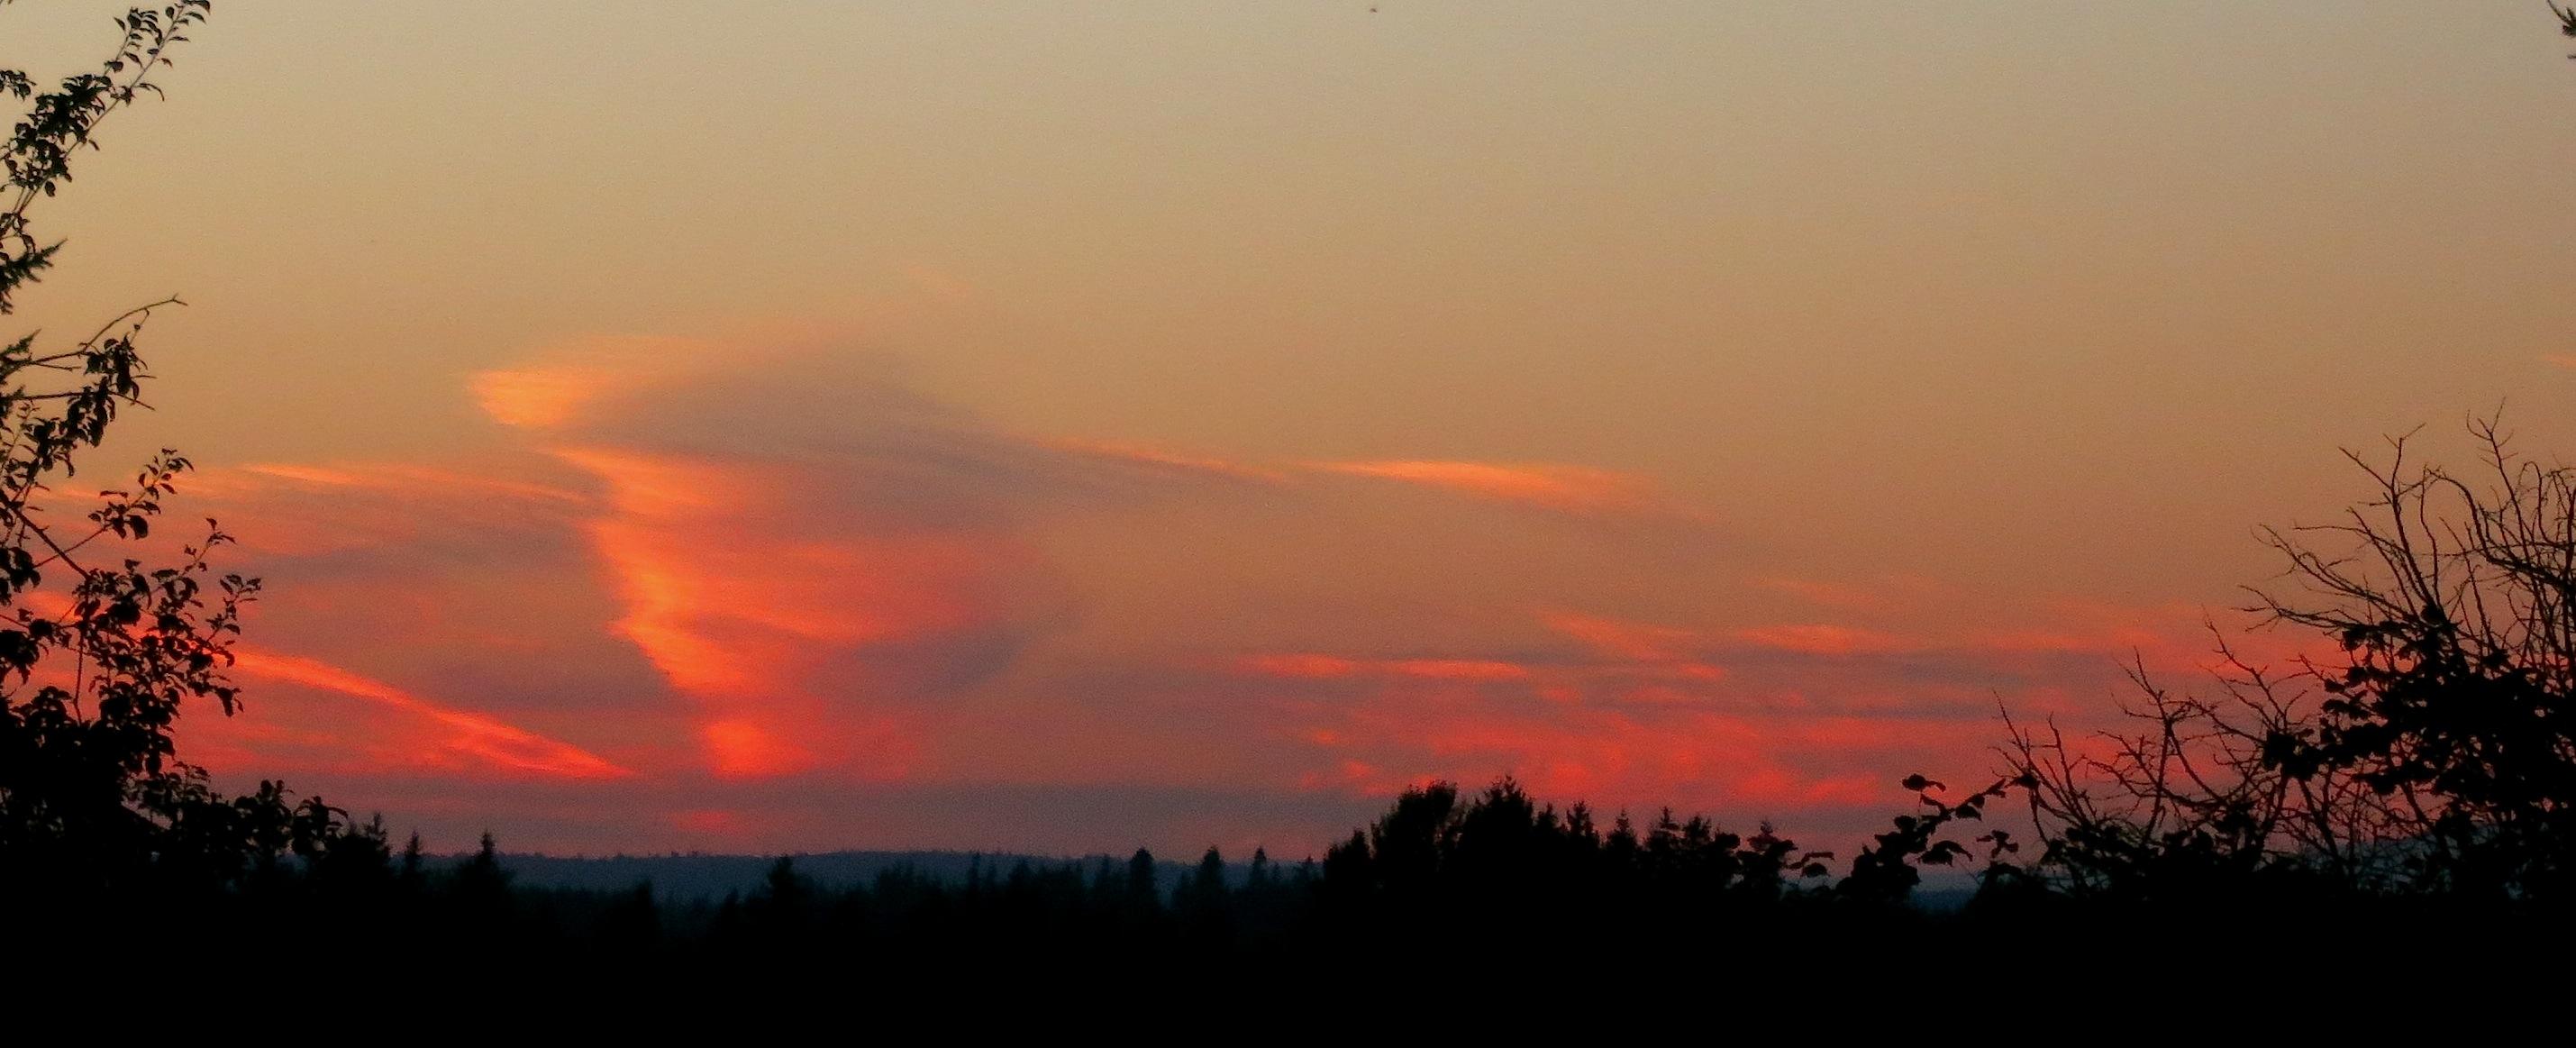 sunset8319